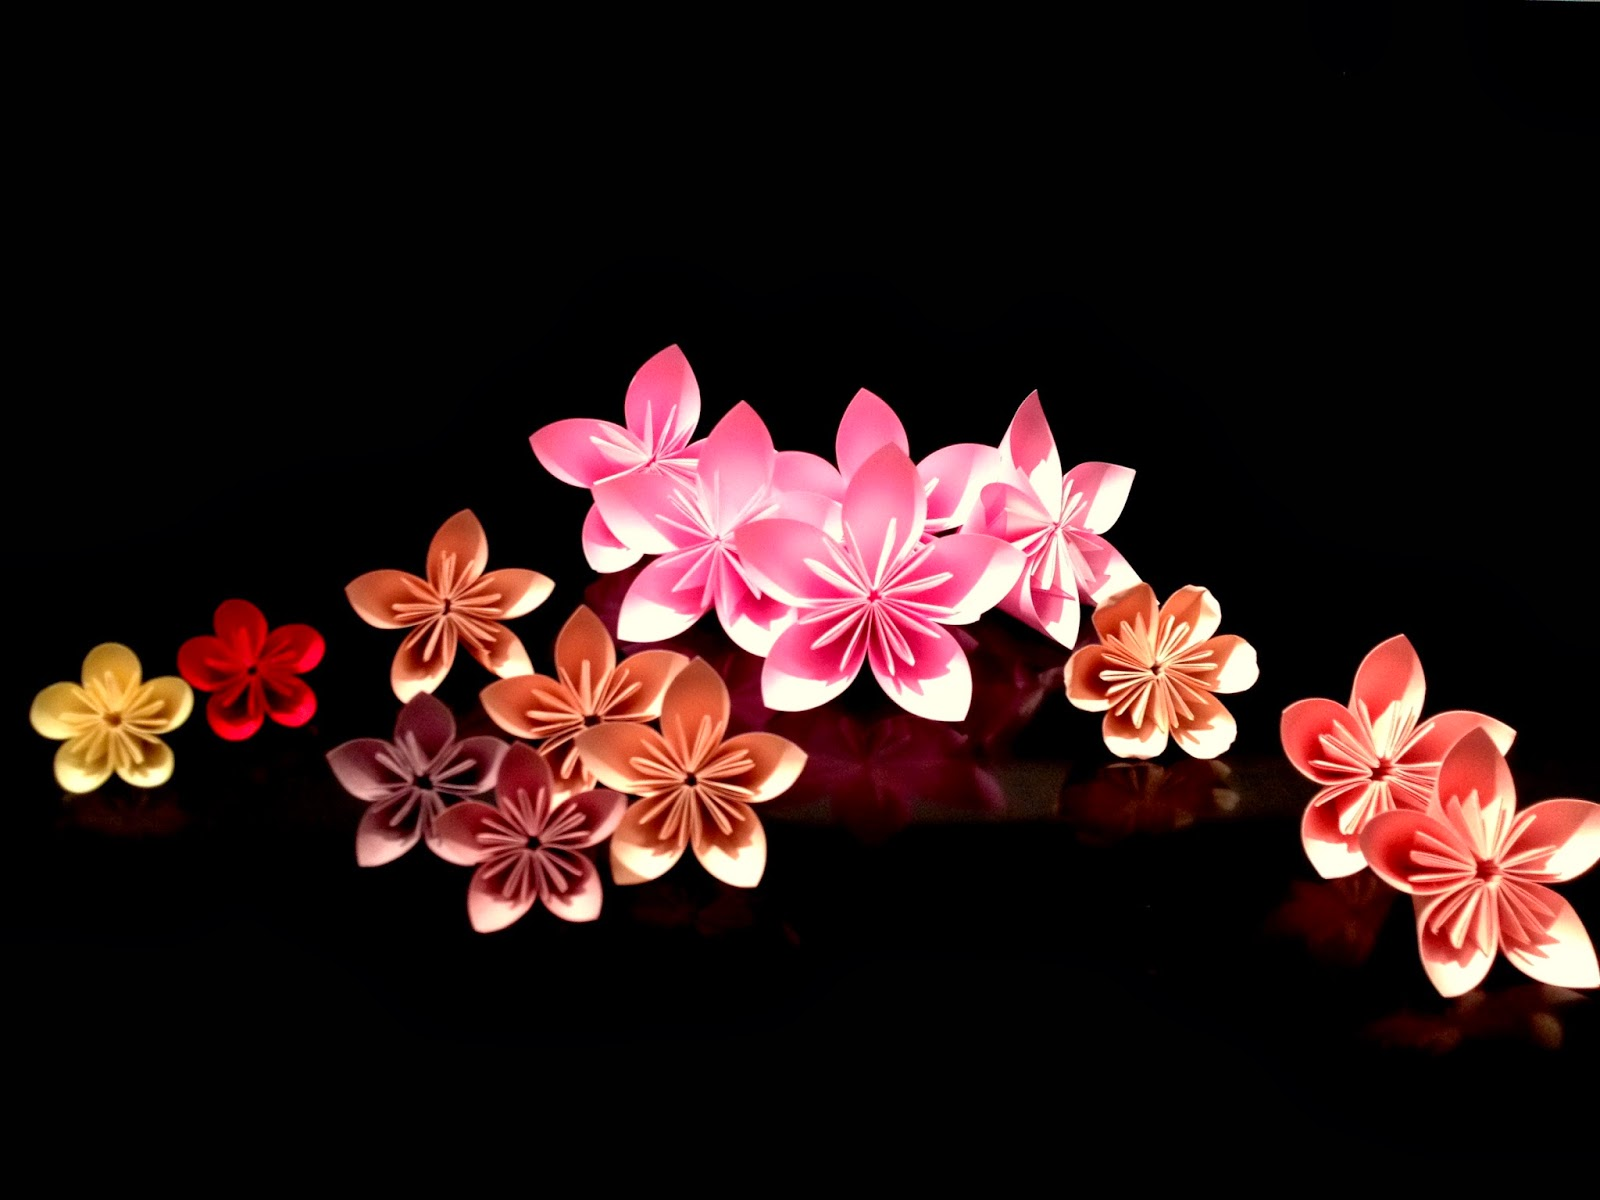 ... *flan-a-la-mode*: サクラサク – Sakura in bloom